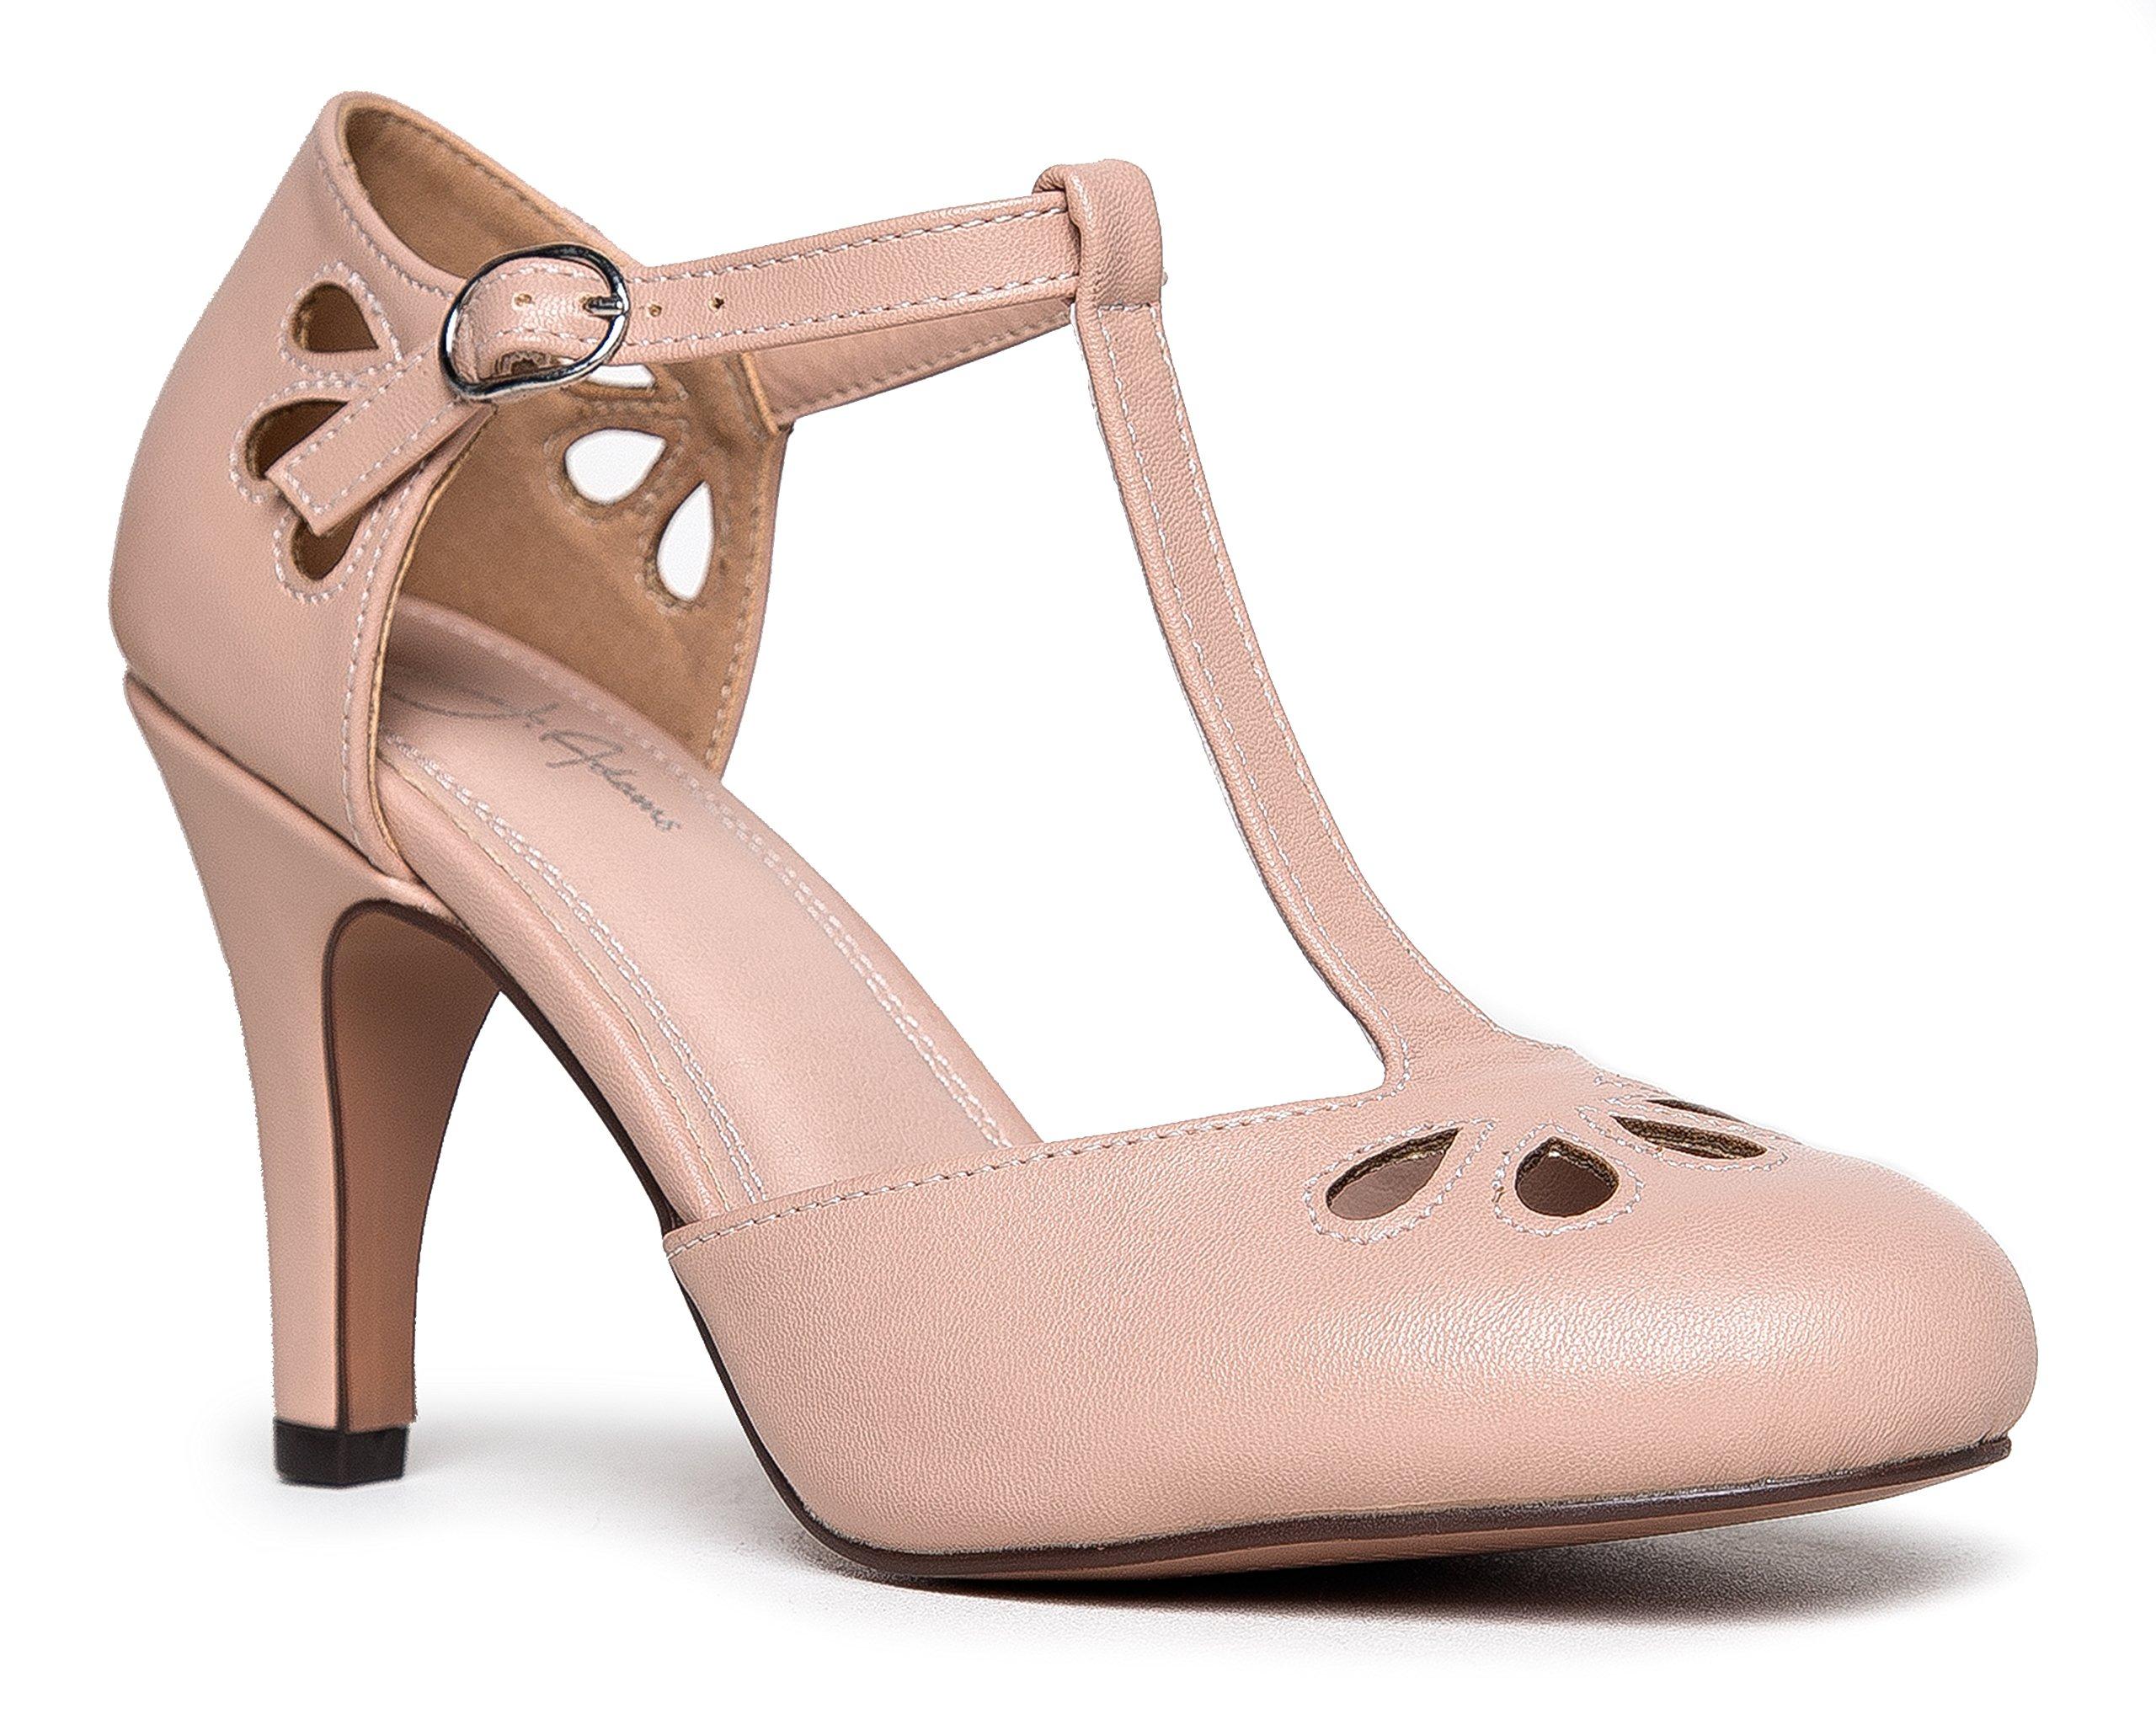 J. Adams Mary Jane Kitten Heels, Nude Pu, 11 B(M) US